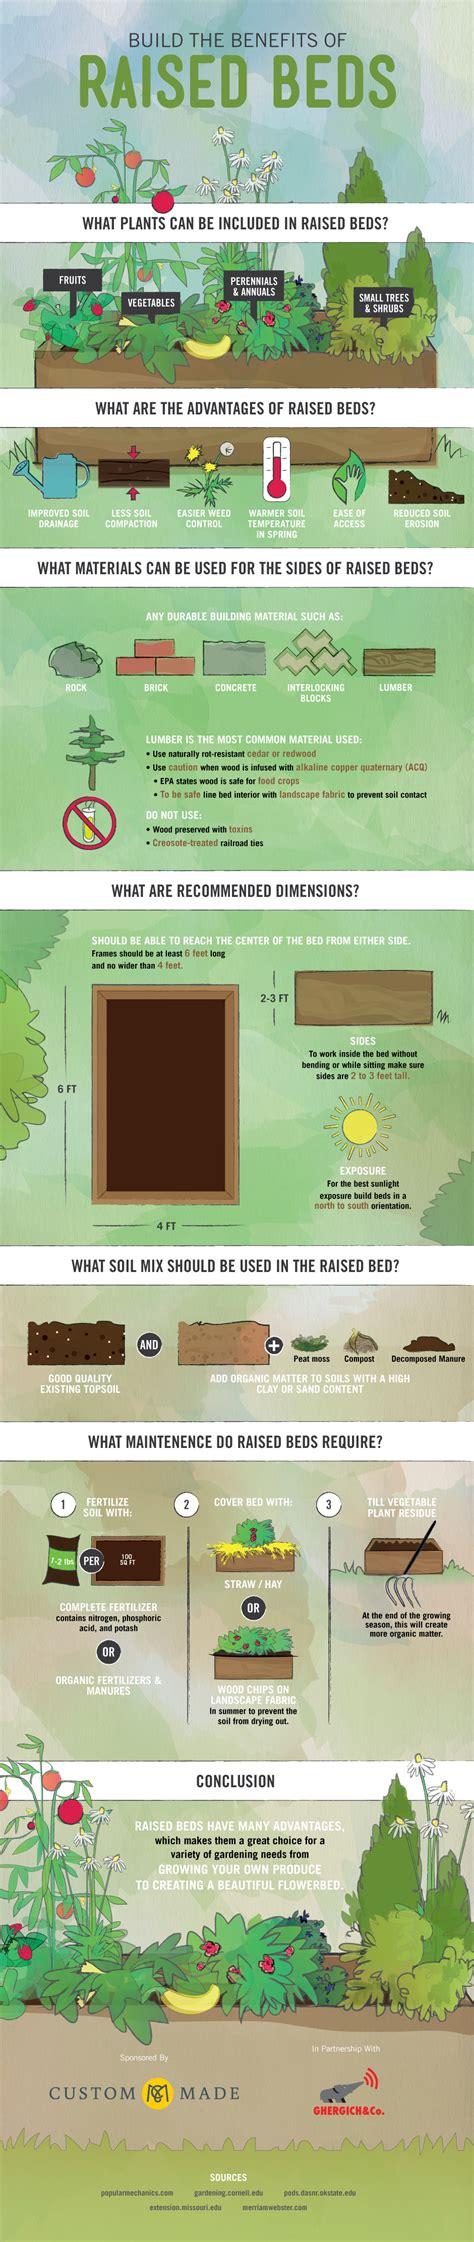 benefits of raised garden beds the benefits of raised garden beds infographic the